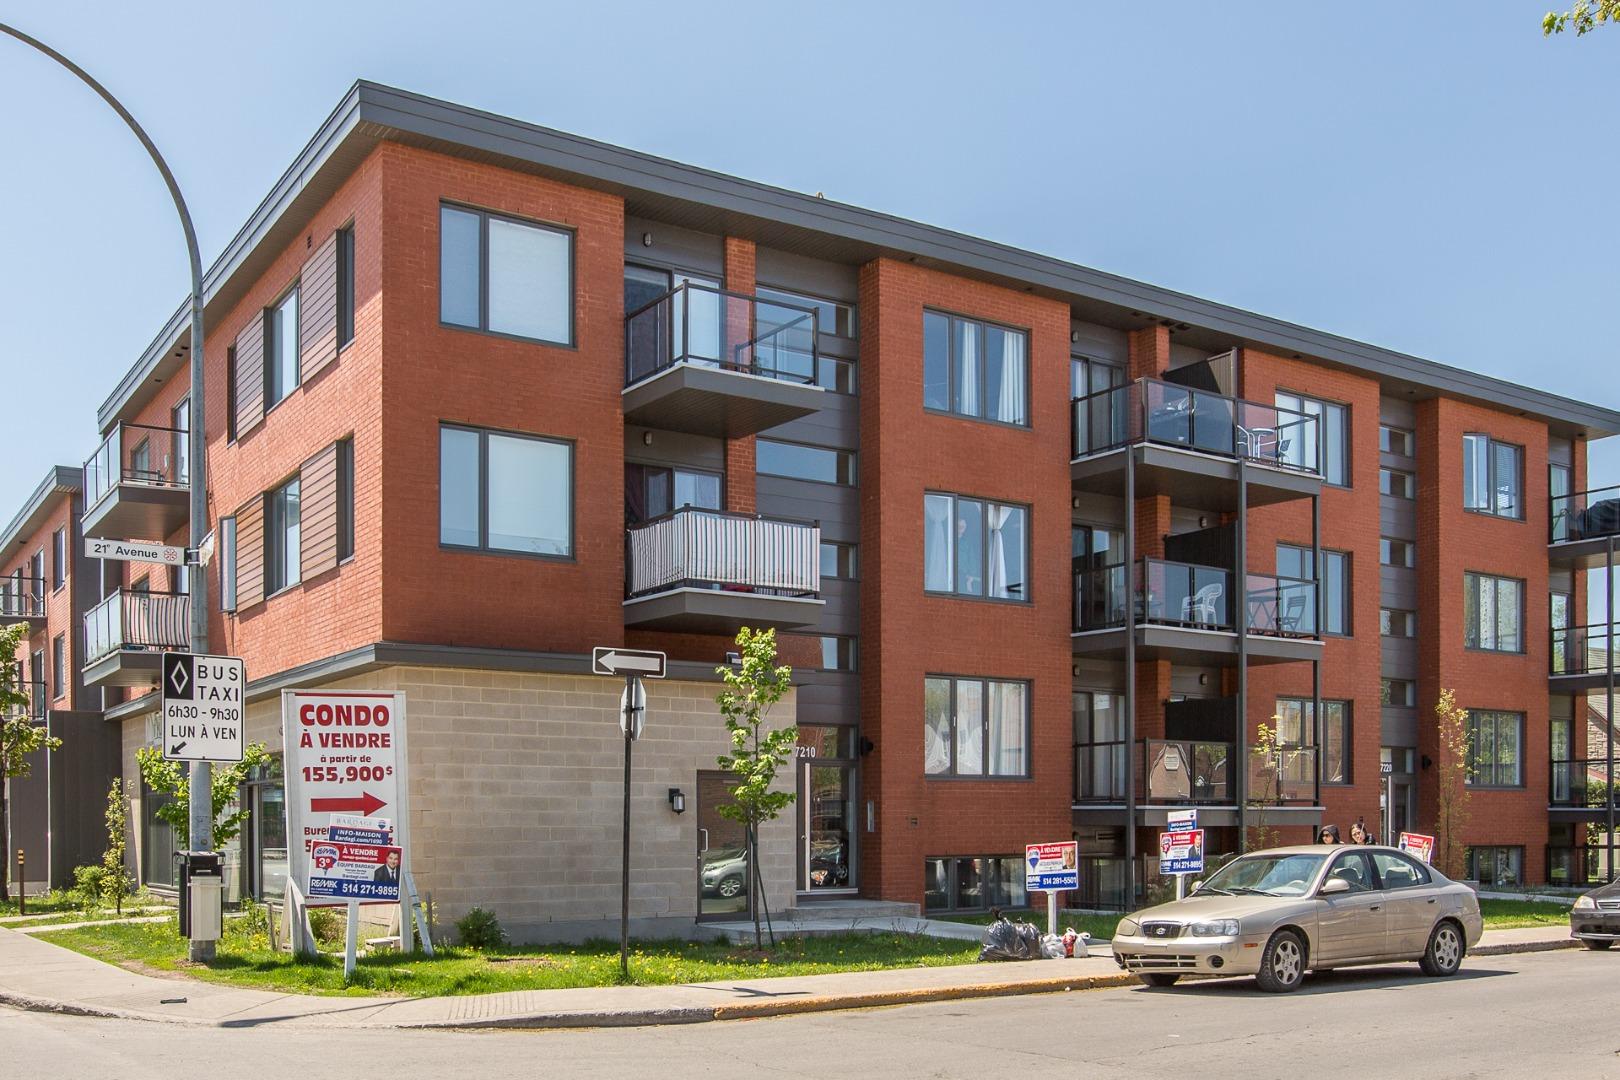 Condo à vendre Montréal - 7220, 21e Avenue